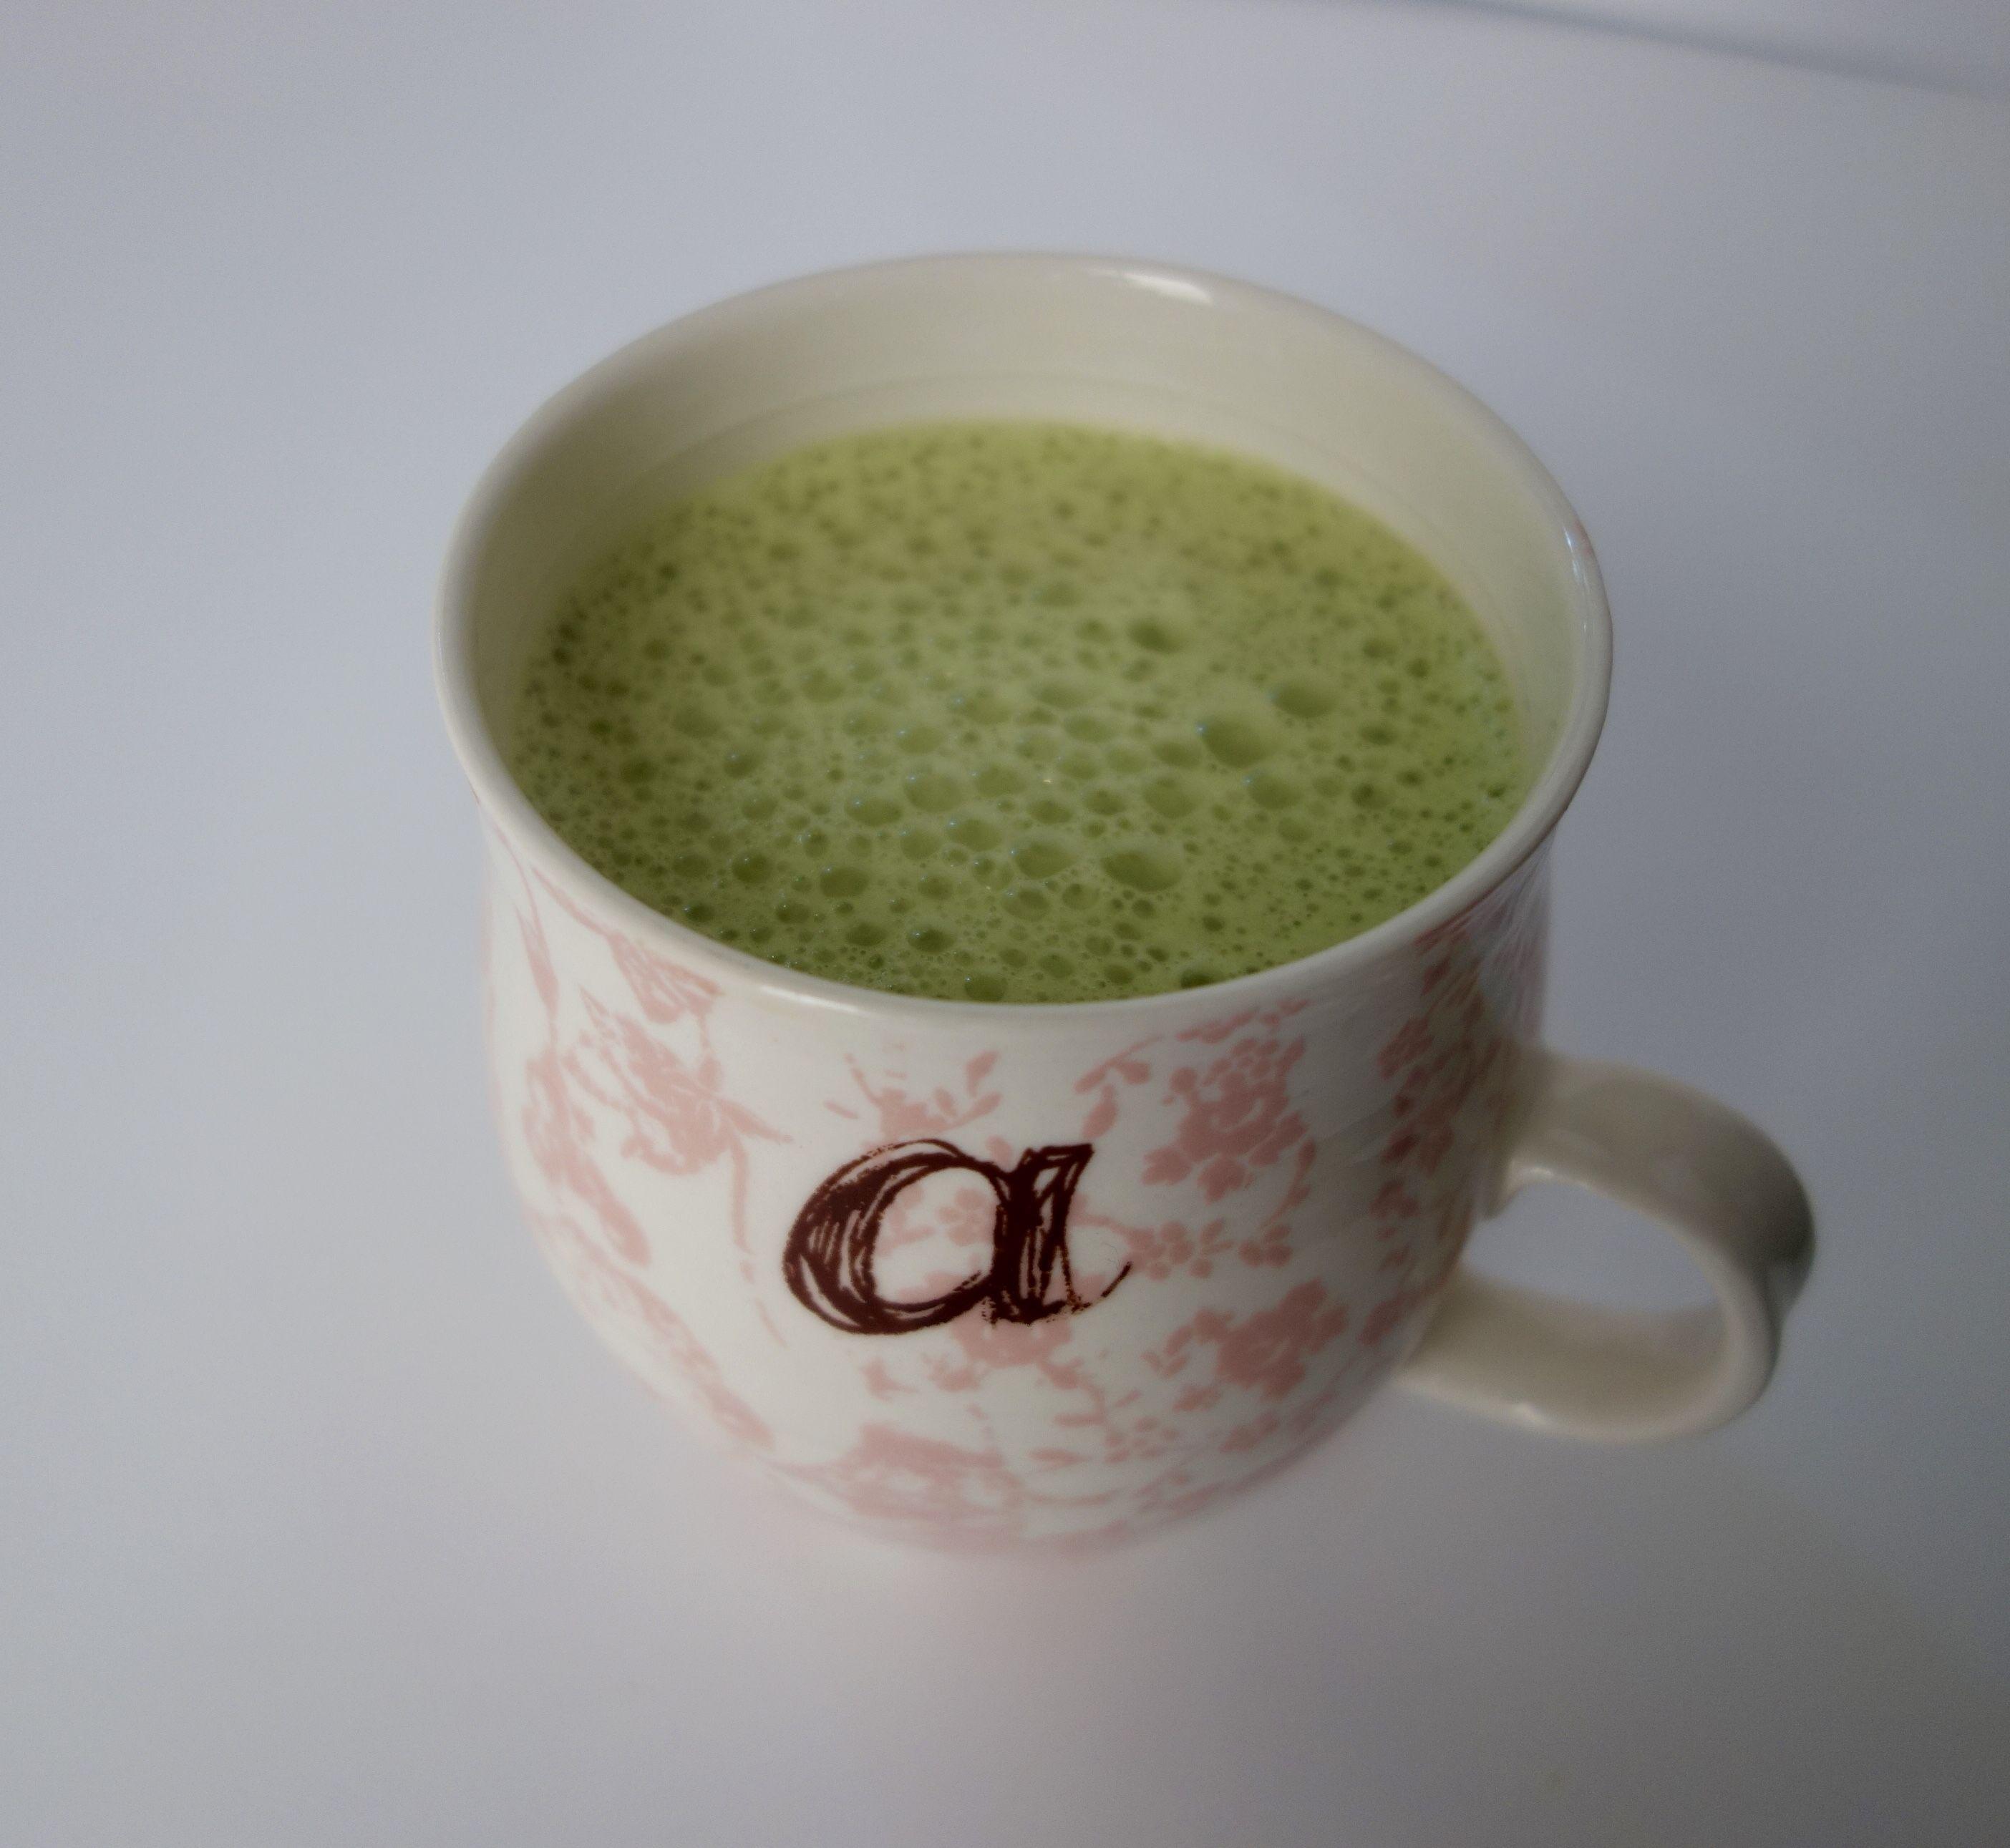 MATCHA GREEN TEA LATTE AT HOME